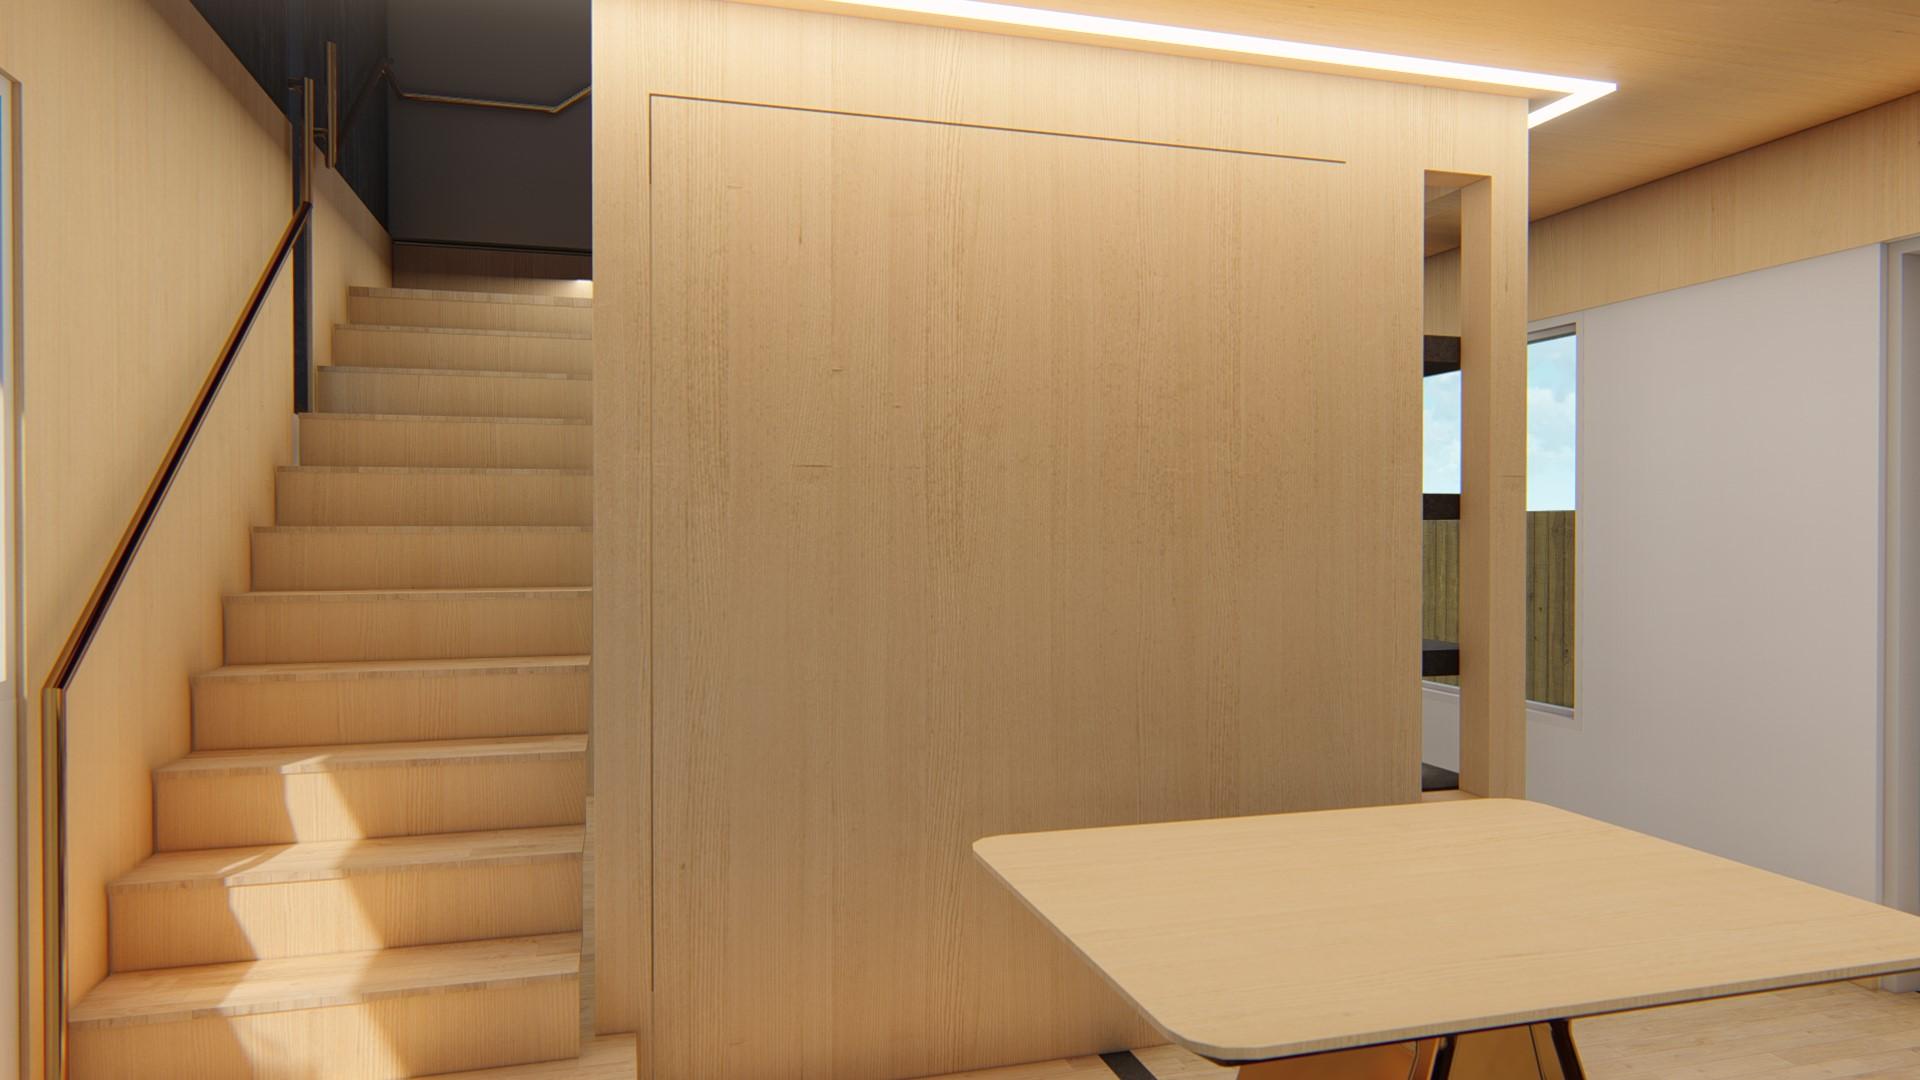 Ghuman - Interior_Scheme D_Photo - 1.jpg